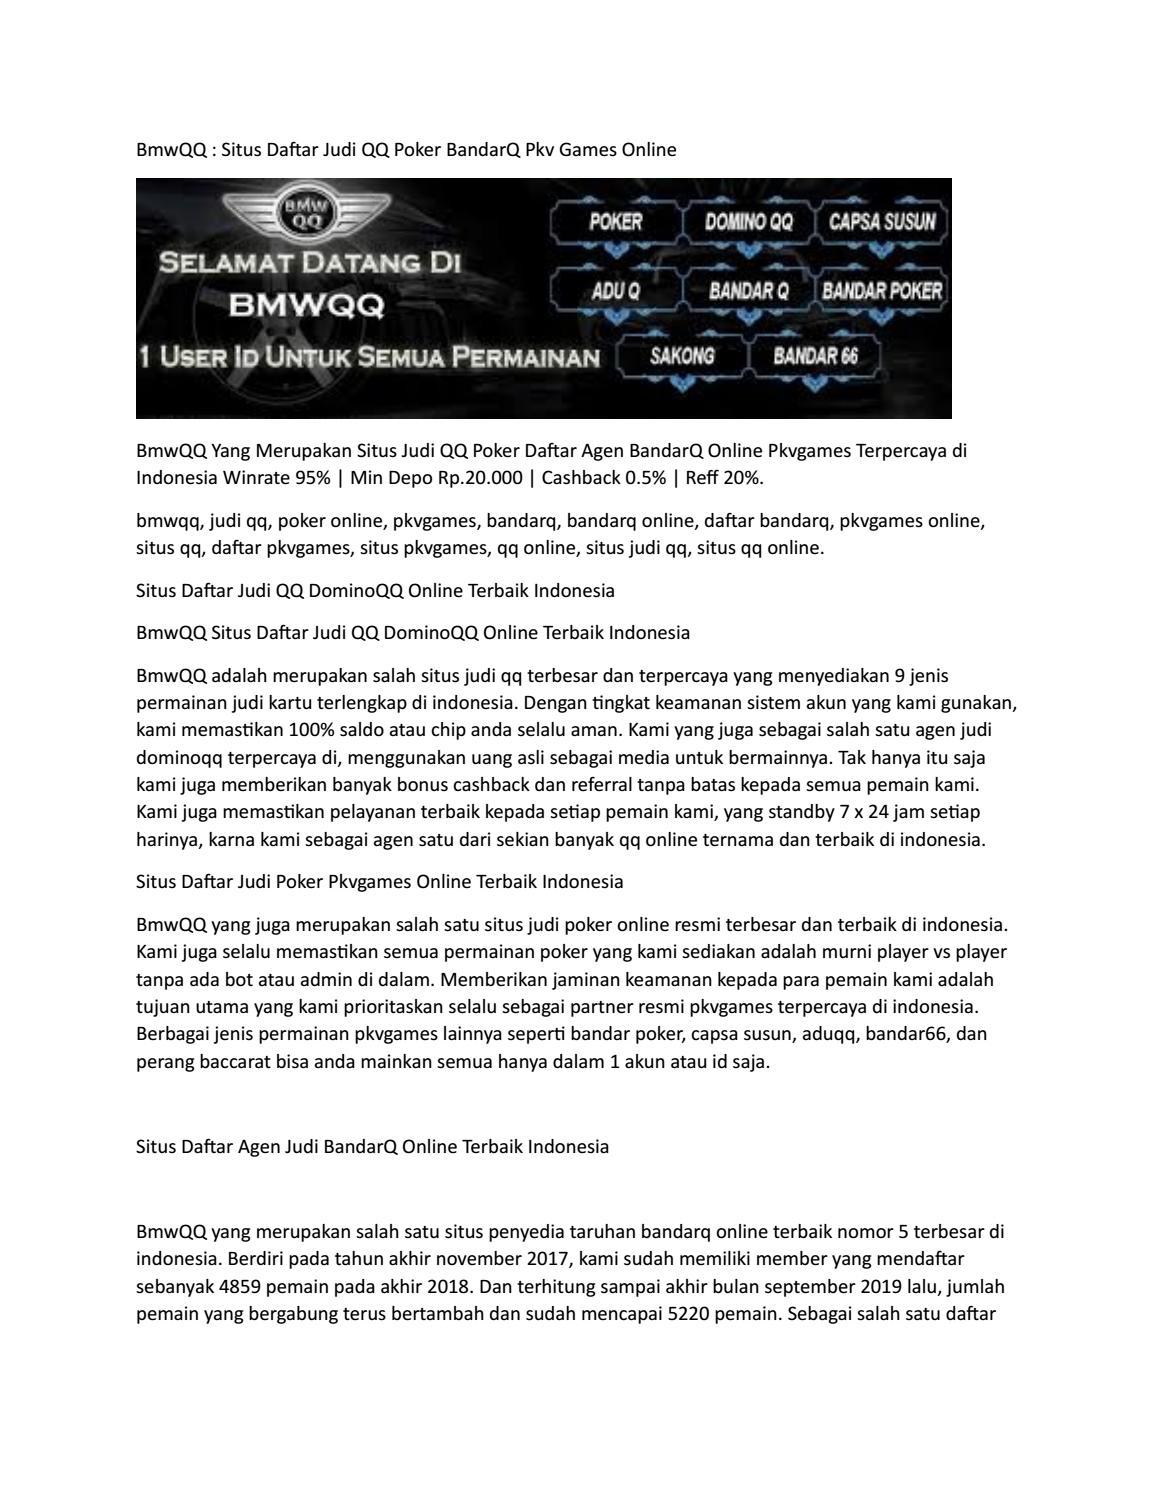 Bmwqq Situs Daftar Judi Qq Poker Bandarq Pkv Games Online By Bmwqq Issuu